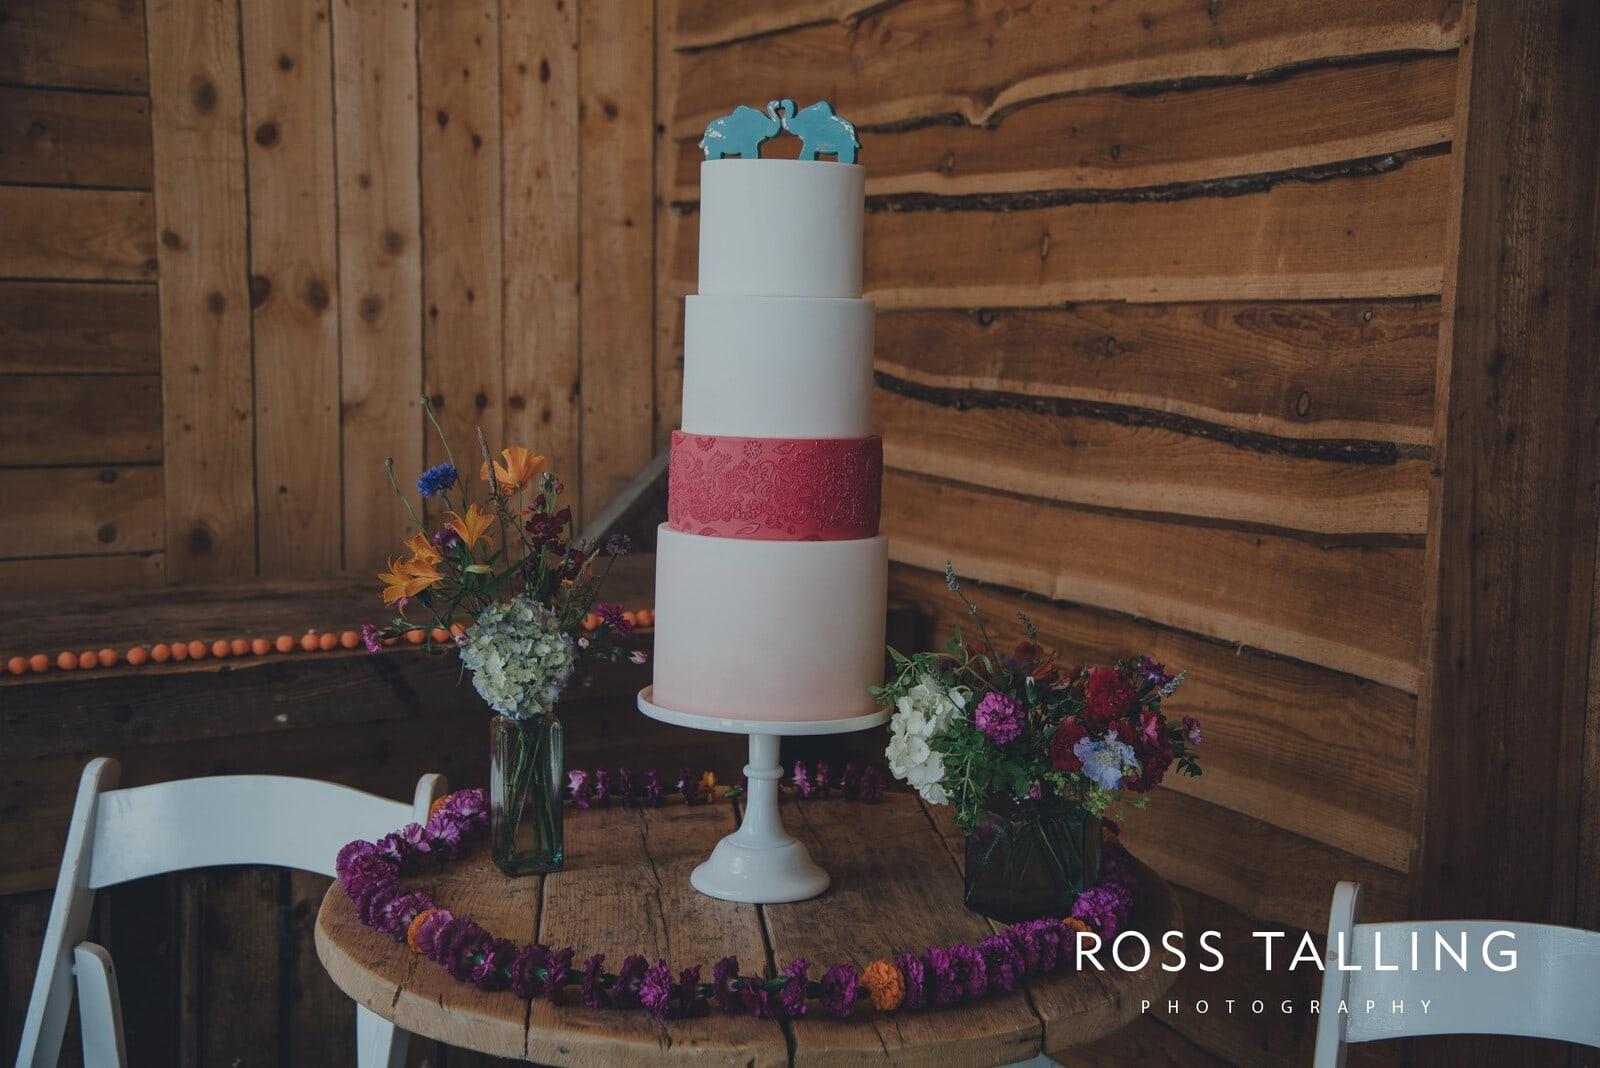 zara-adey-nancarow-farm-wedding-photography-cornwall_0079